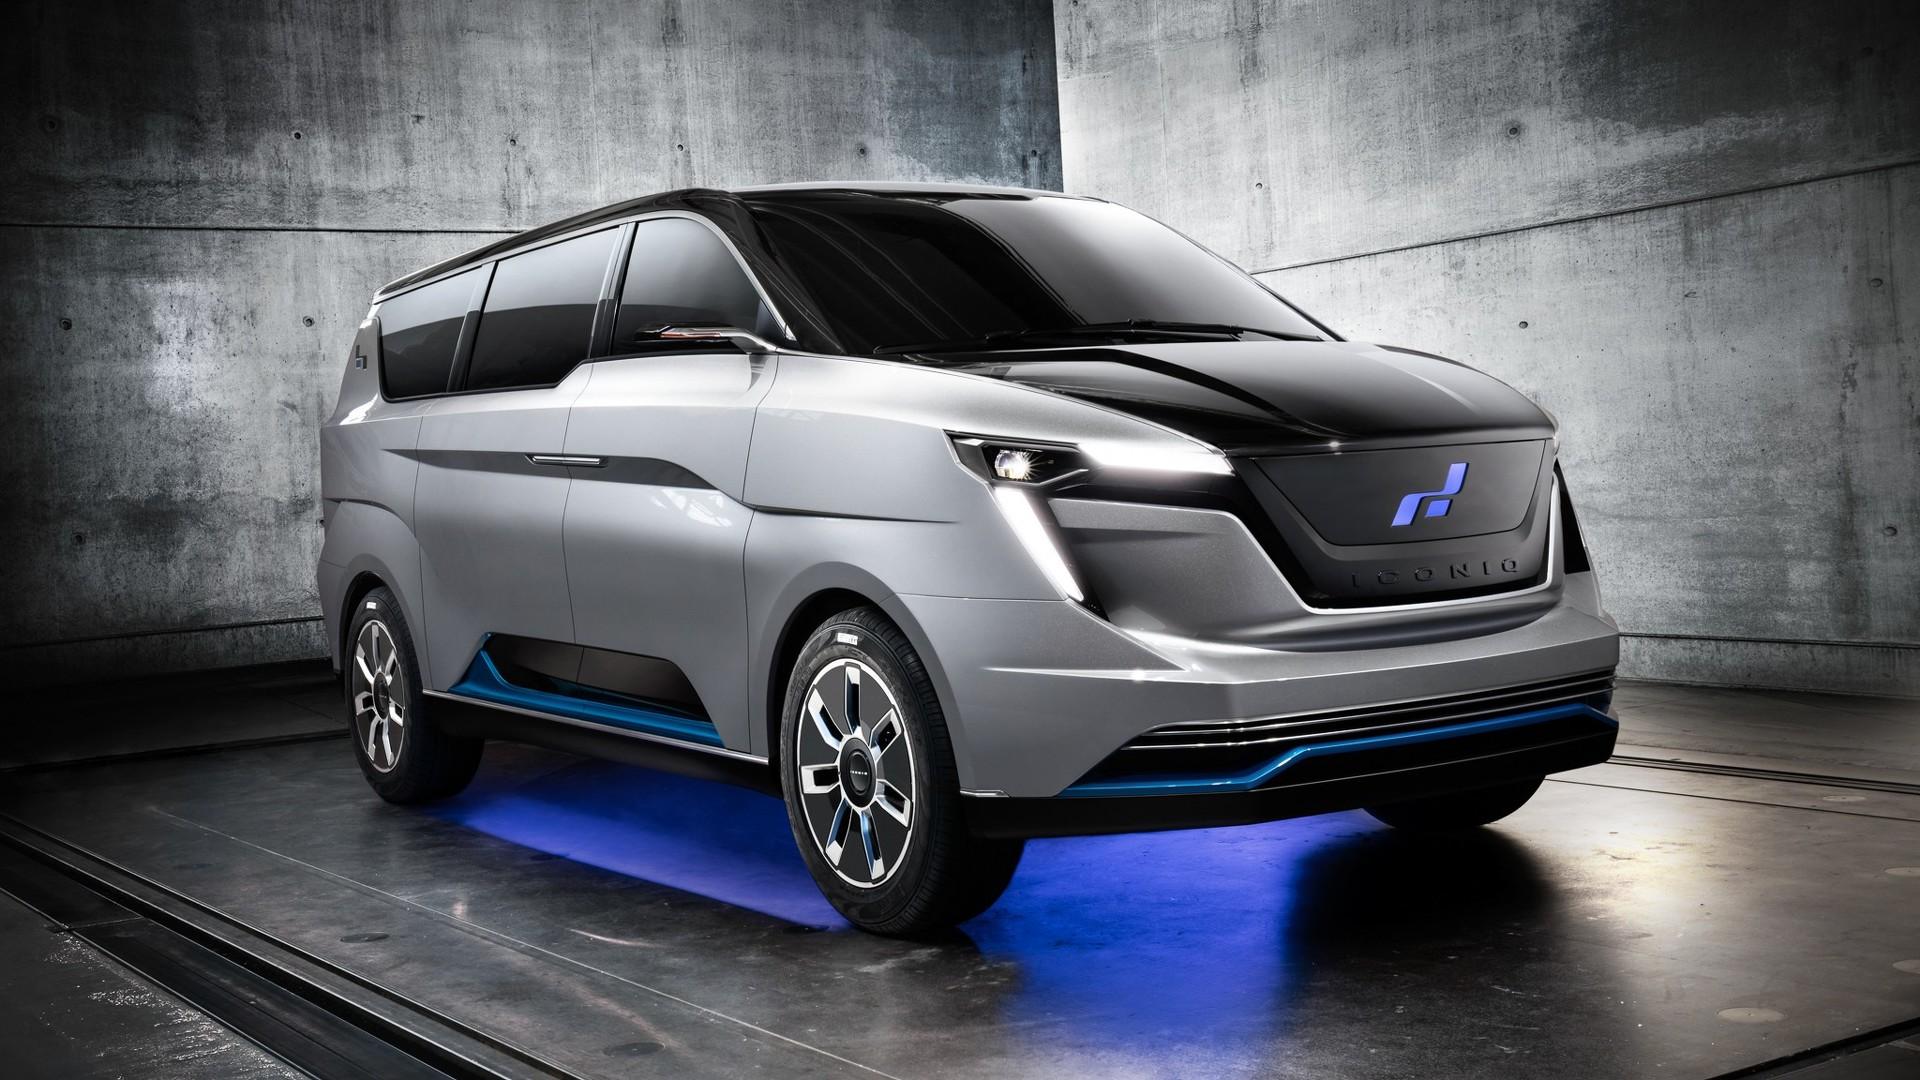 W Motors Debuting Design Of Iconiq Seven Electric Vehicle